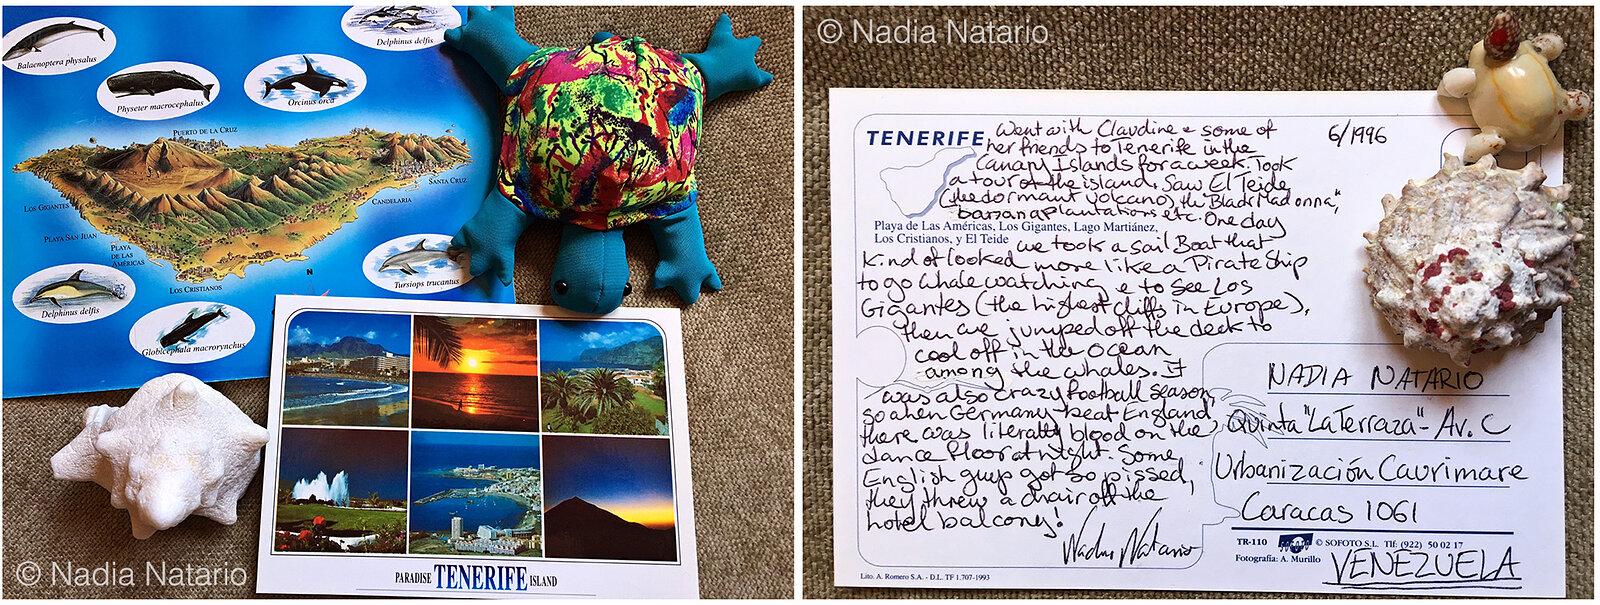 Postcards to Myself - Tenerife, Canary Islands, 1996